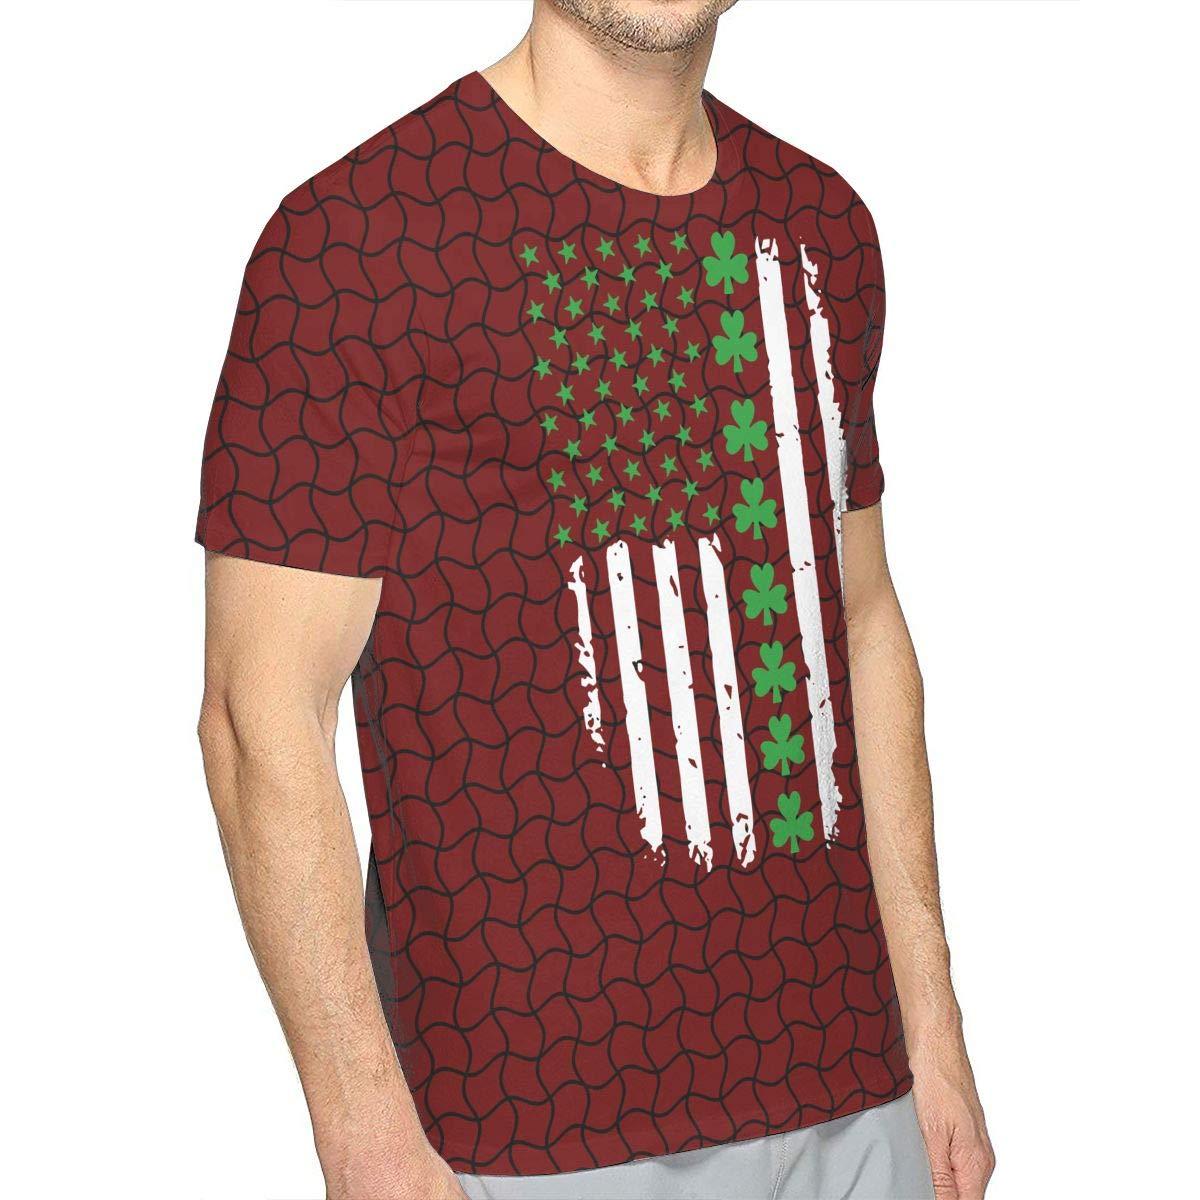 JJKKFG-H St Patricks Day Irish American Flag Mens Fashion Short-Sleeved Tee Shirt